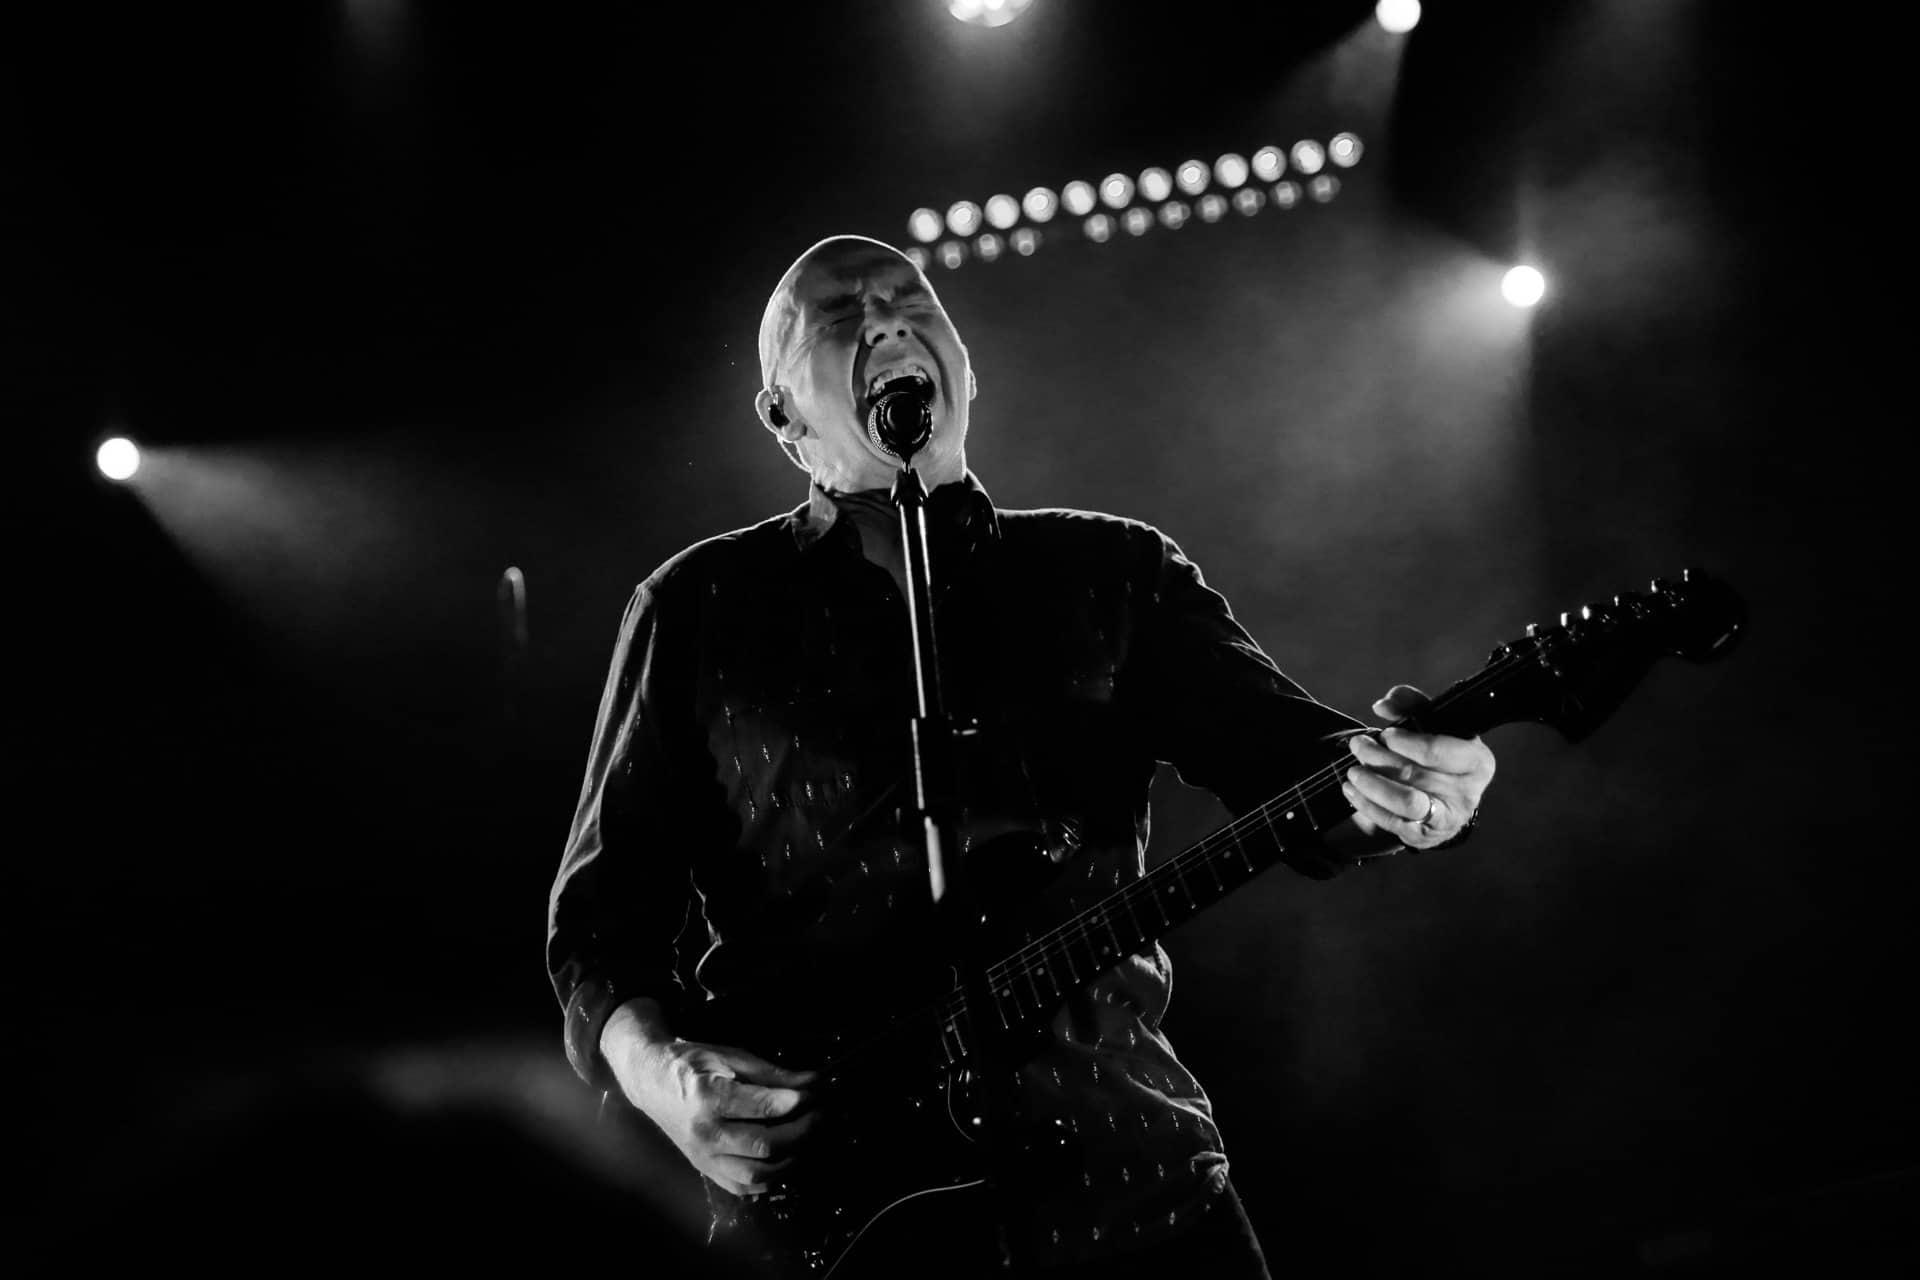 Midge Ure Live + Paul Young | Concert Photography